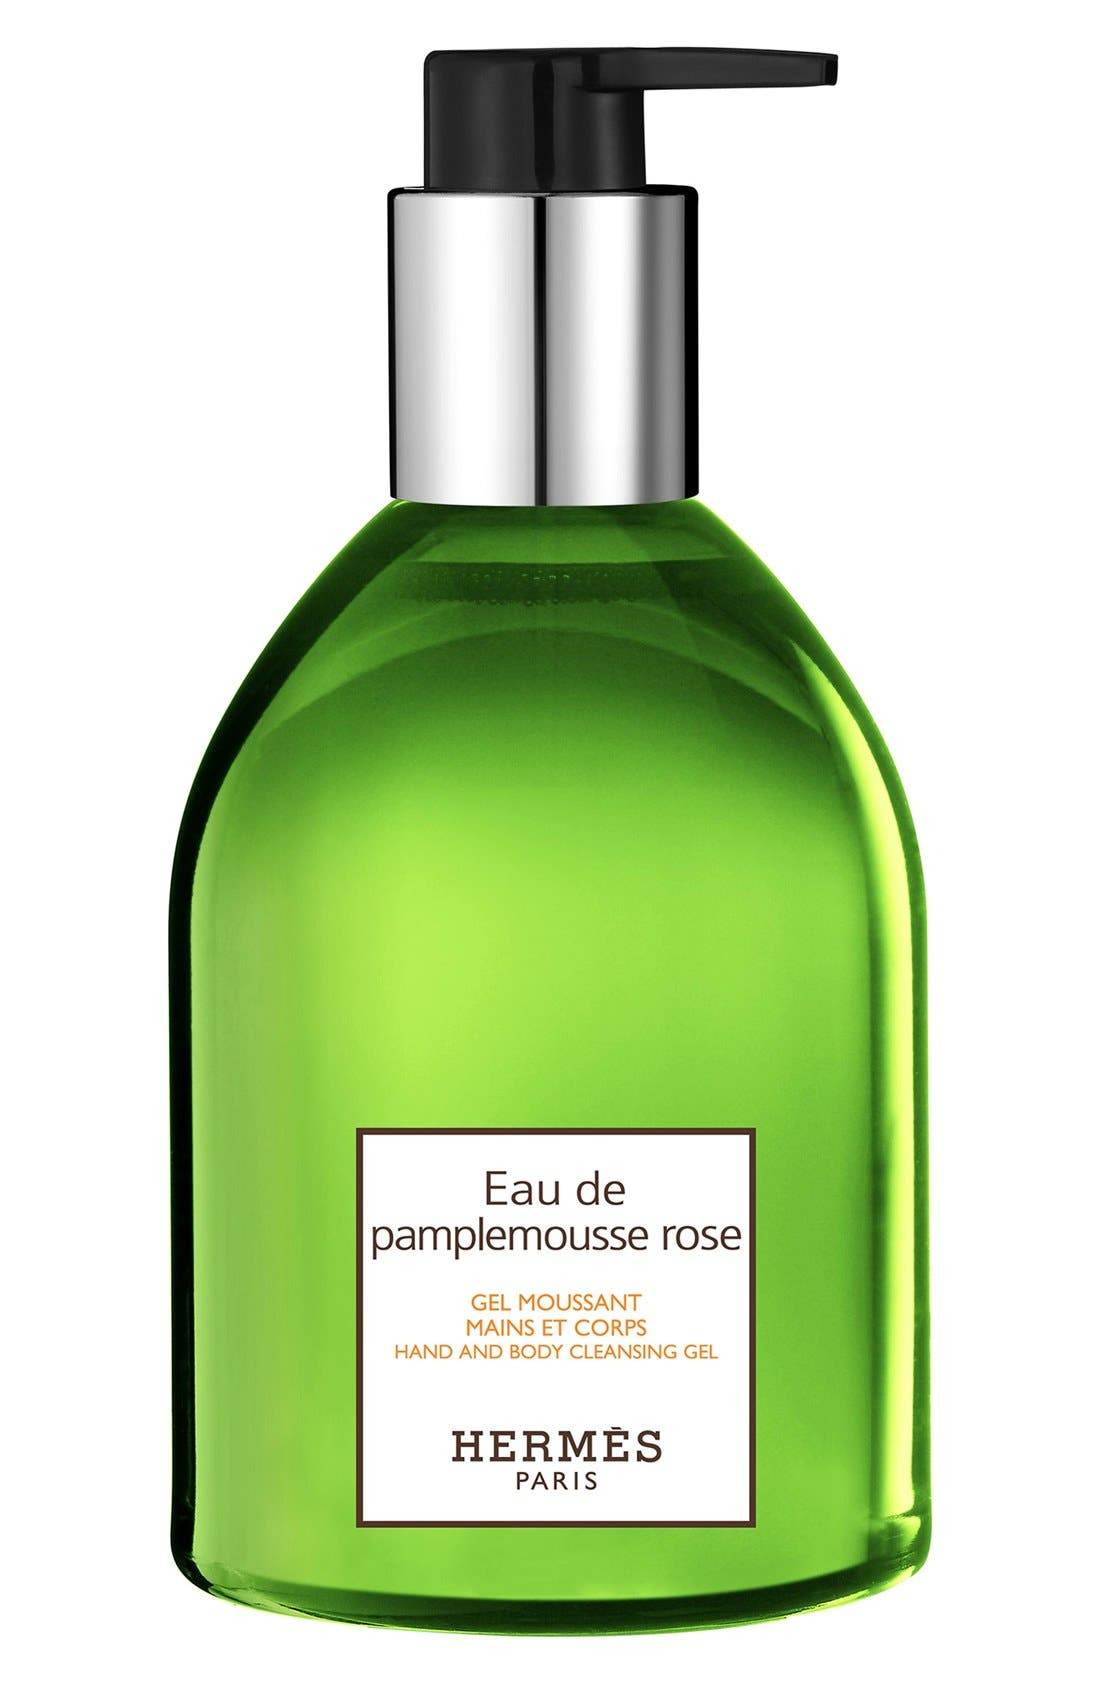 Hermès Eau de Pamplemousse Rose - Hand and body cleansing gel